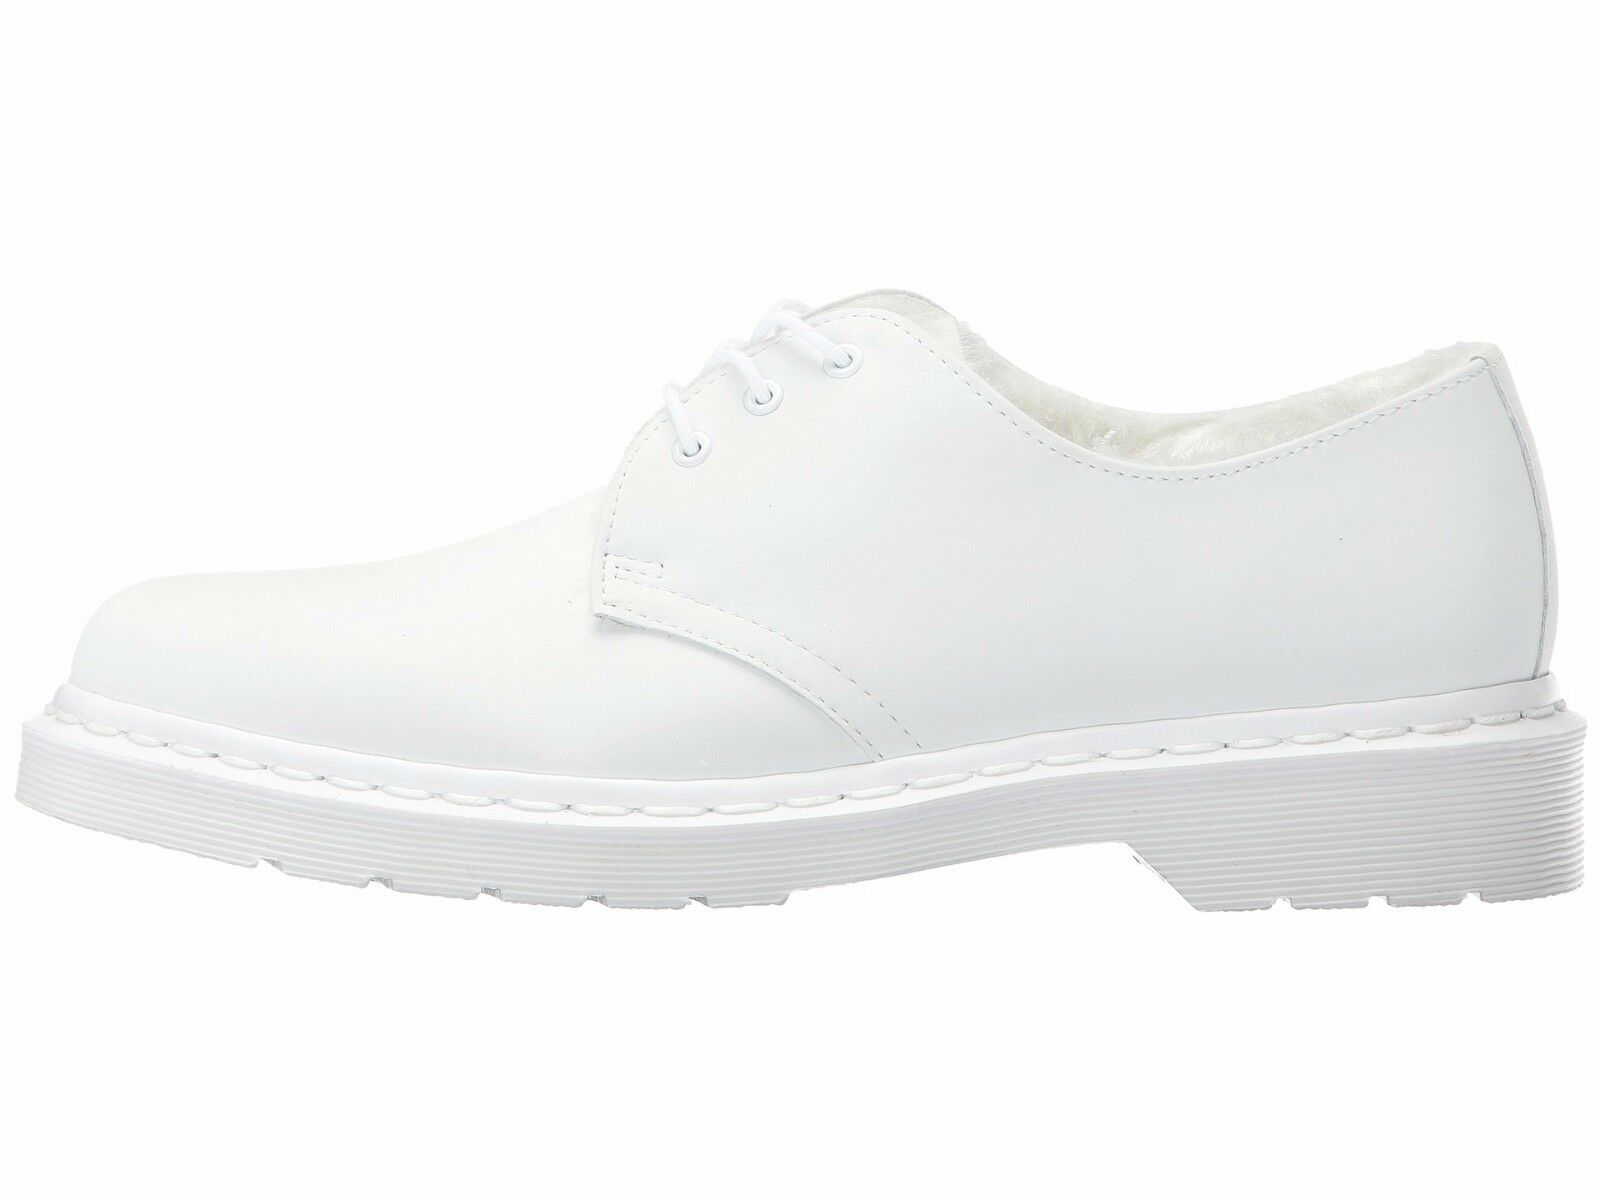 NIB Dr. Martens Martens Martens Women's FUR LINED 1461 MONO 3-Eye Leather Oxford shoes 4aa4c9